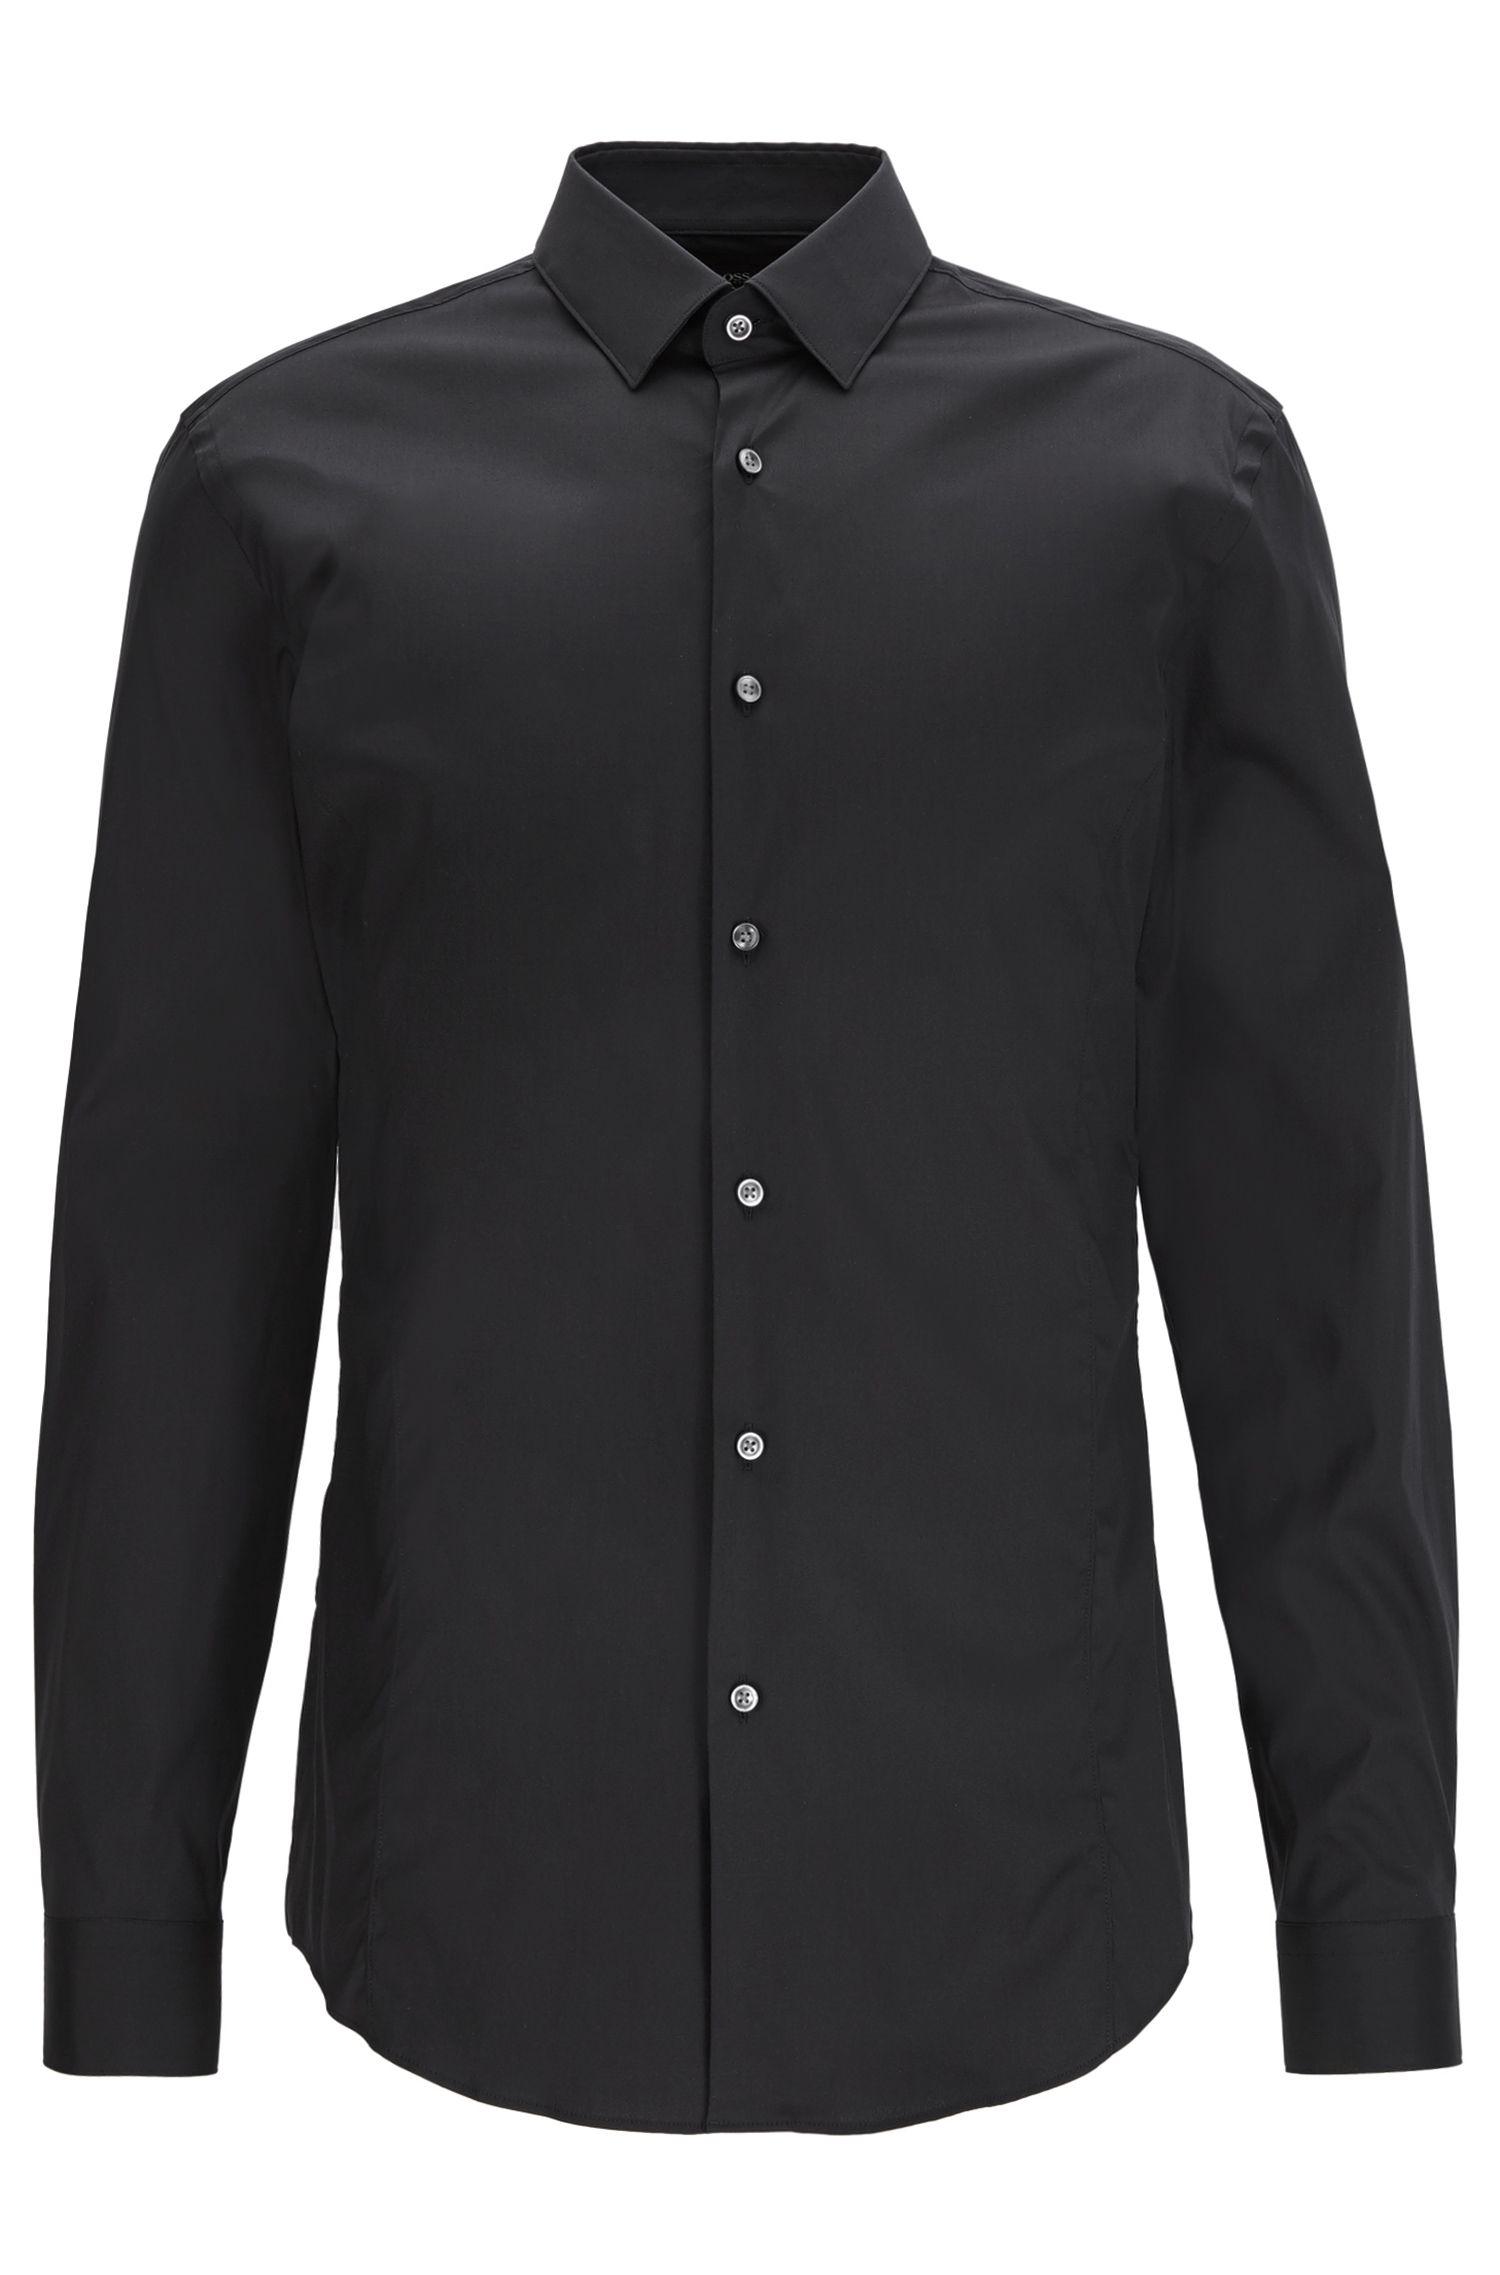 Cotton Blend Shirt, Slim Fit | Ilan